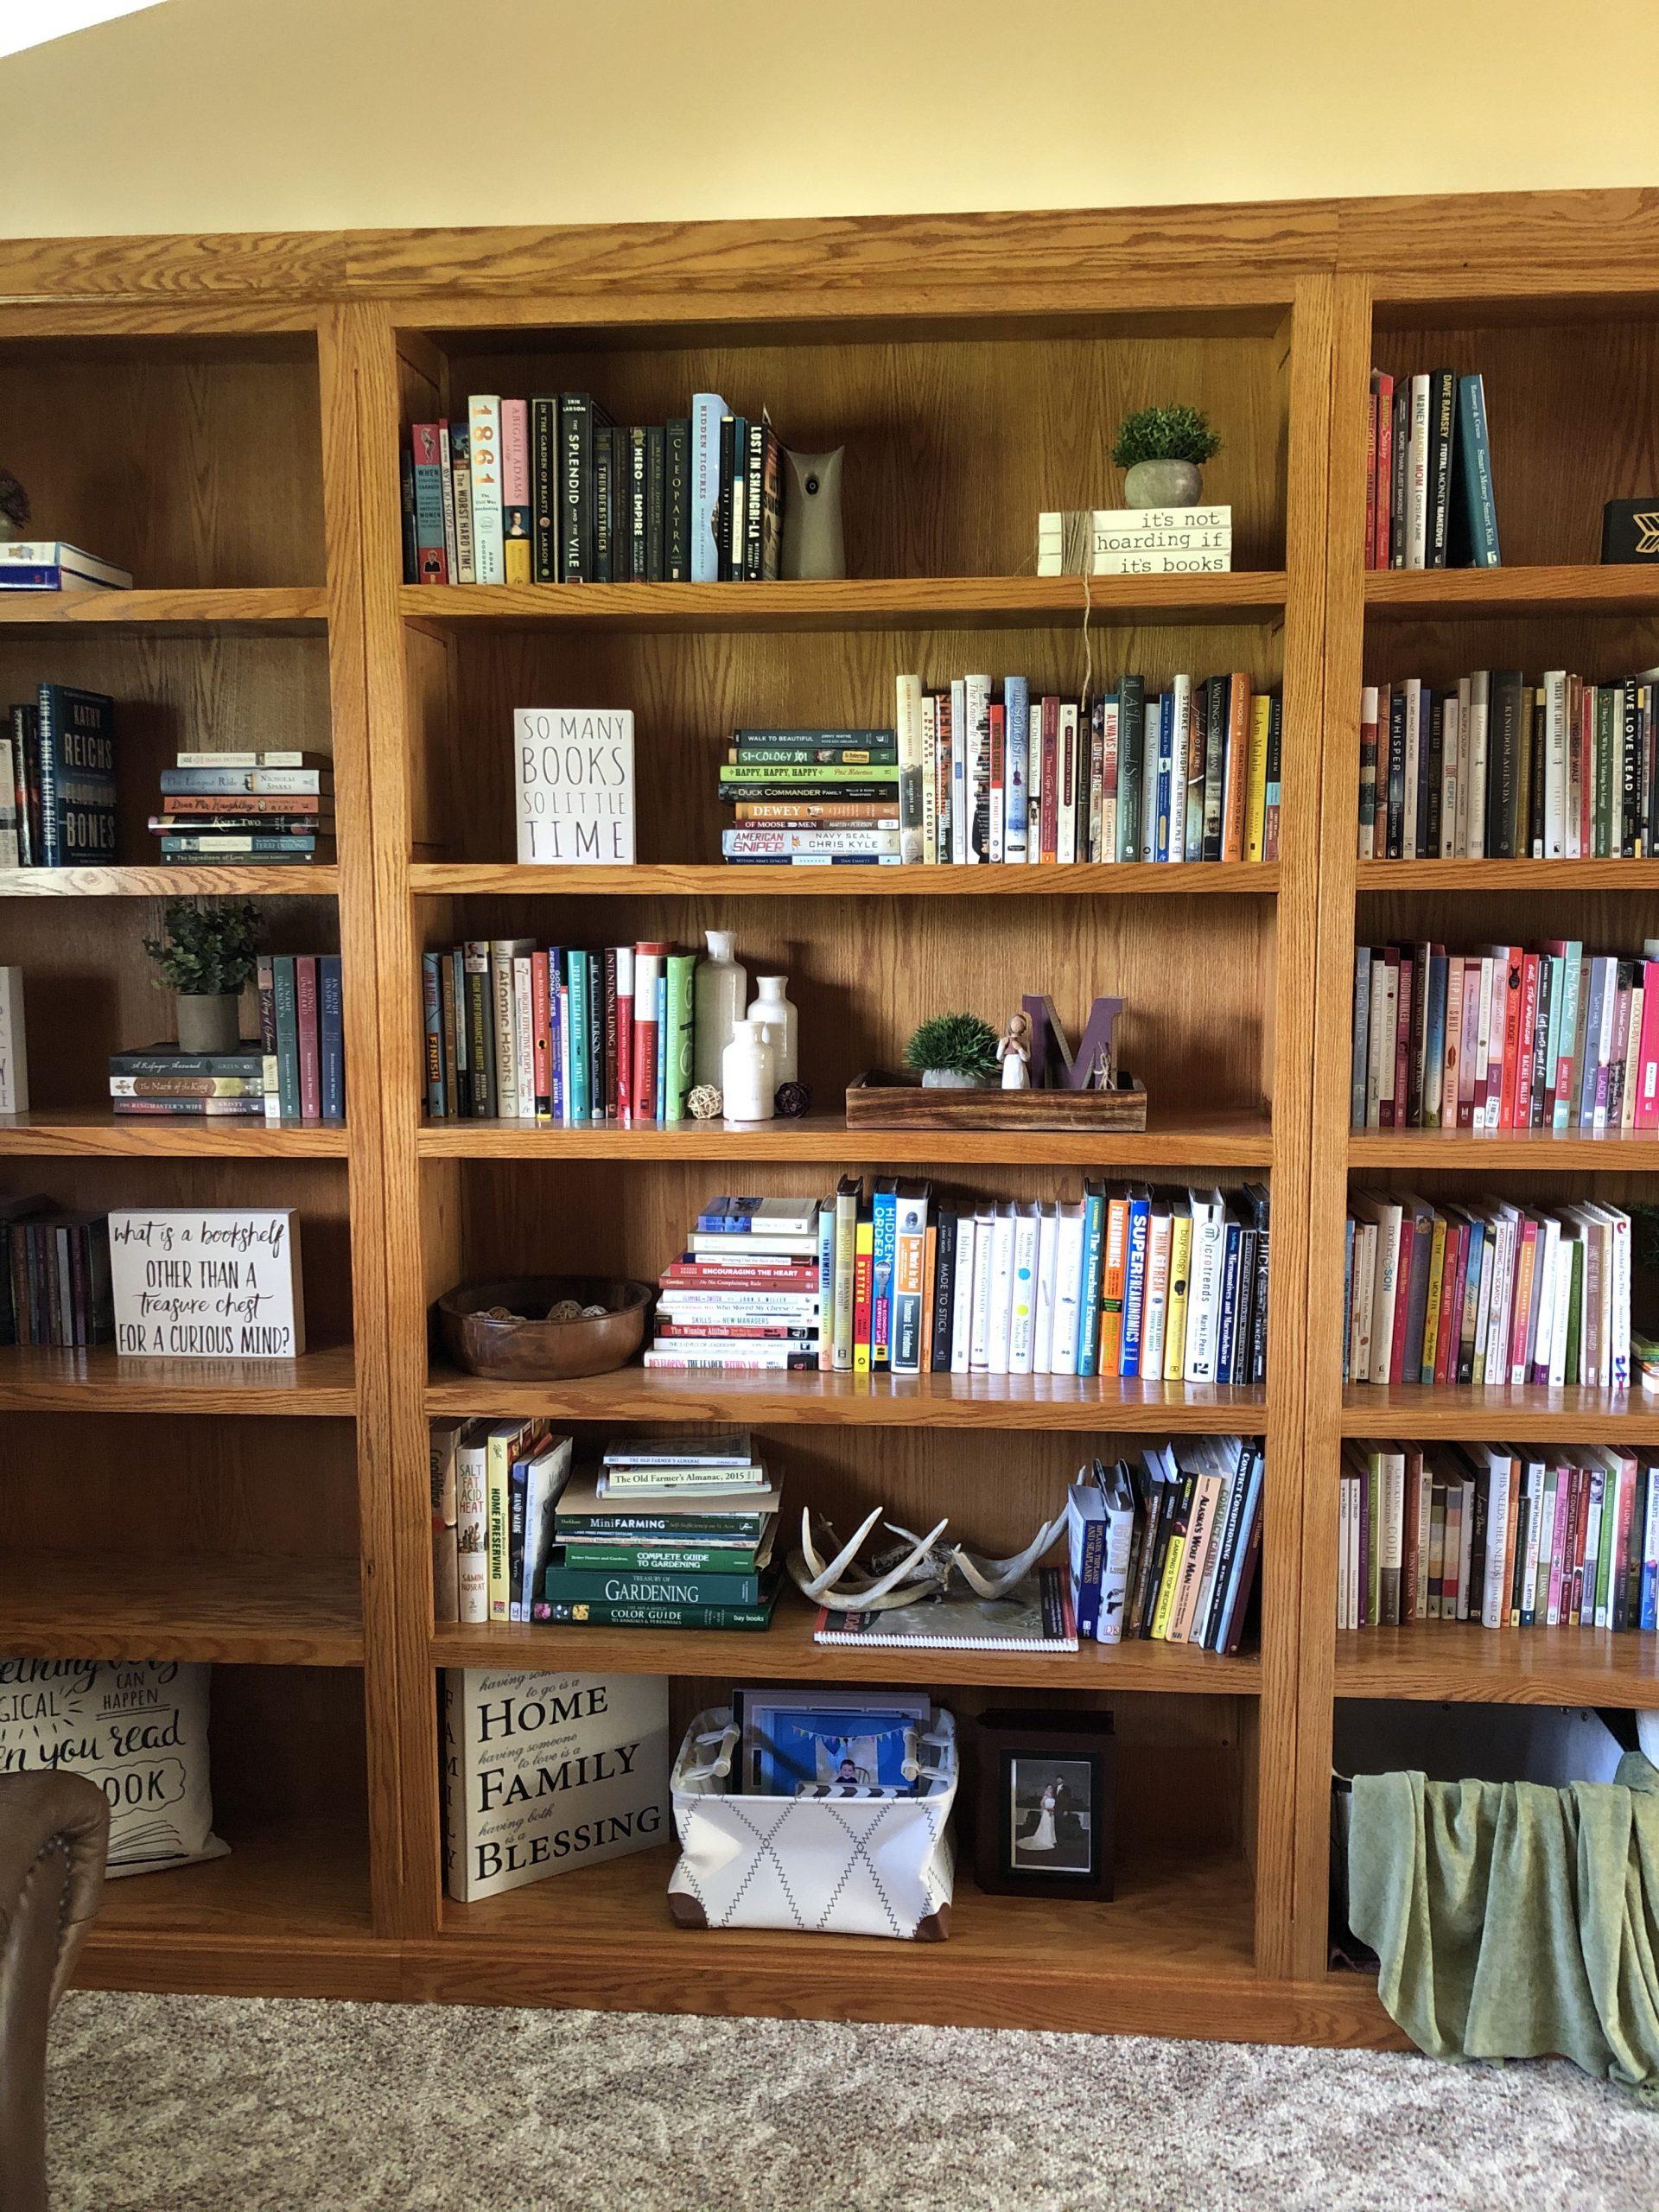 Middle bookcase -- General nonfiction